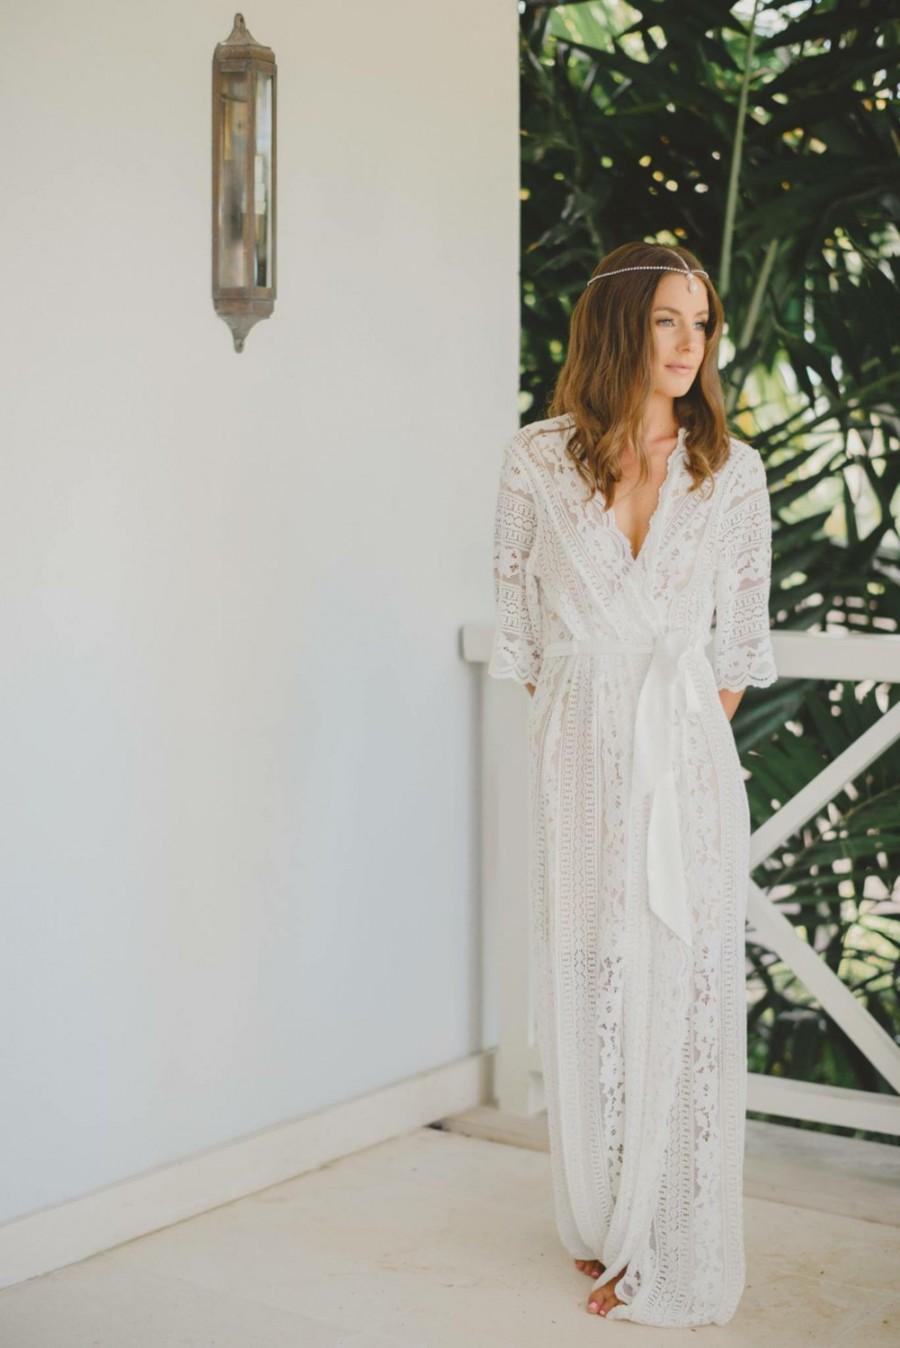 a few days away save up to 60% official Lace Bridal Robe // Bridesmaid Robes // Robe // Bridal Robe ...